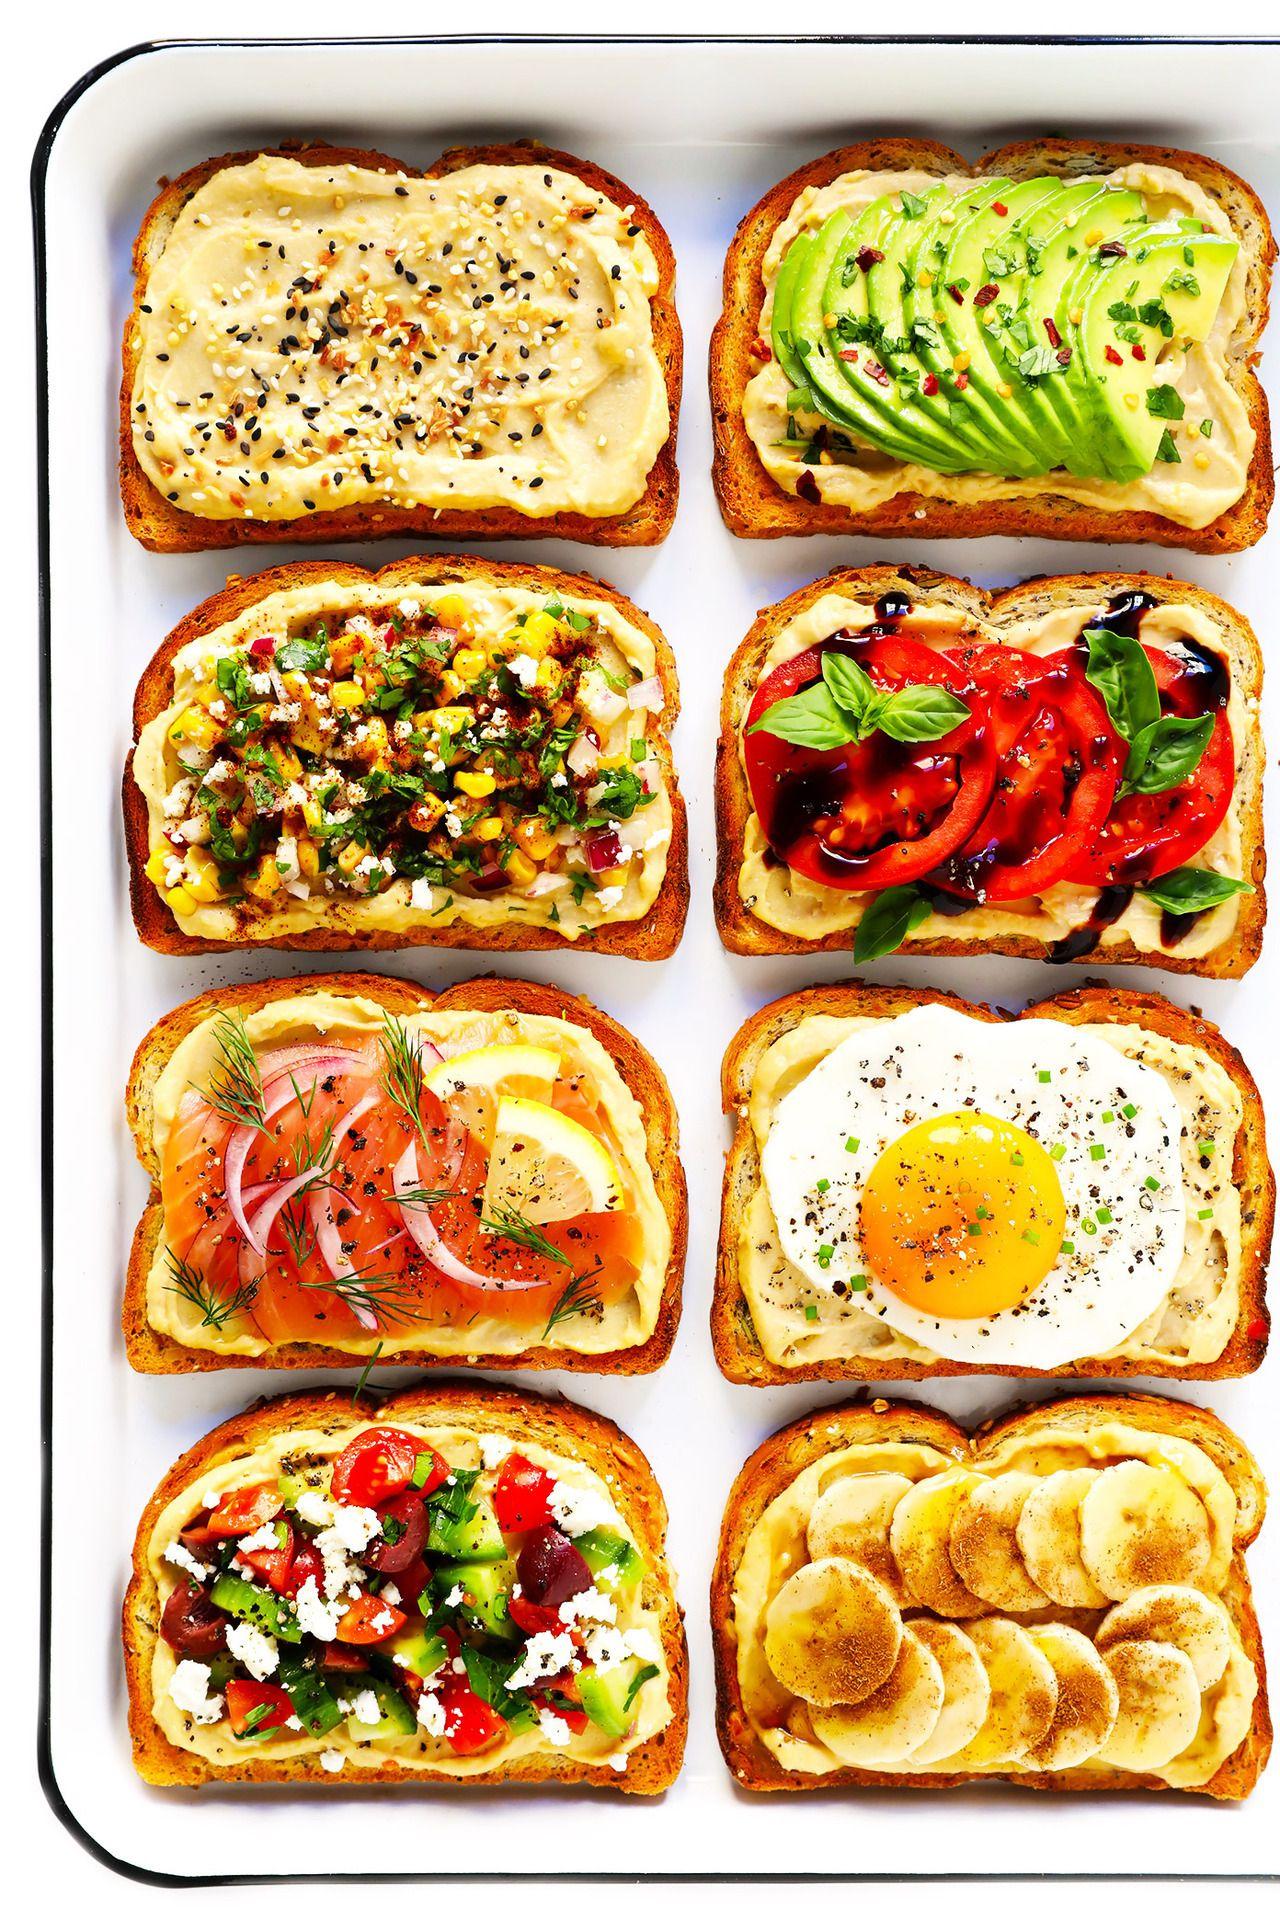 Hummus Toast 8 Ways Comida Saludable Desayuno Comida Saludable Recetas De Comida Saludable